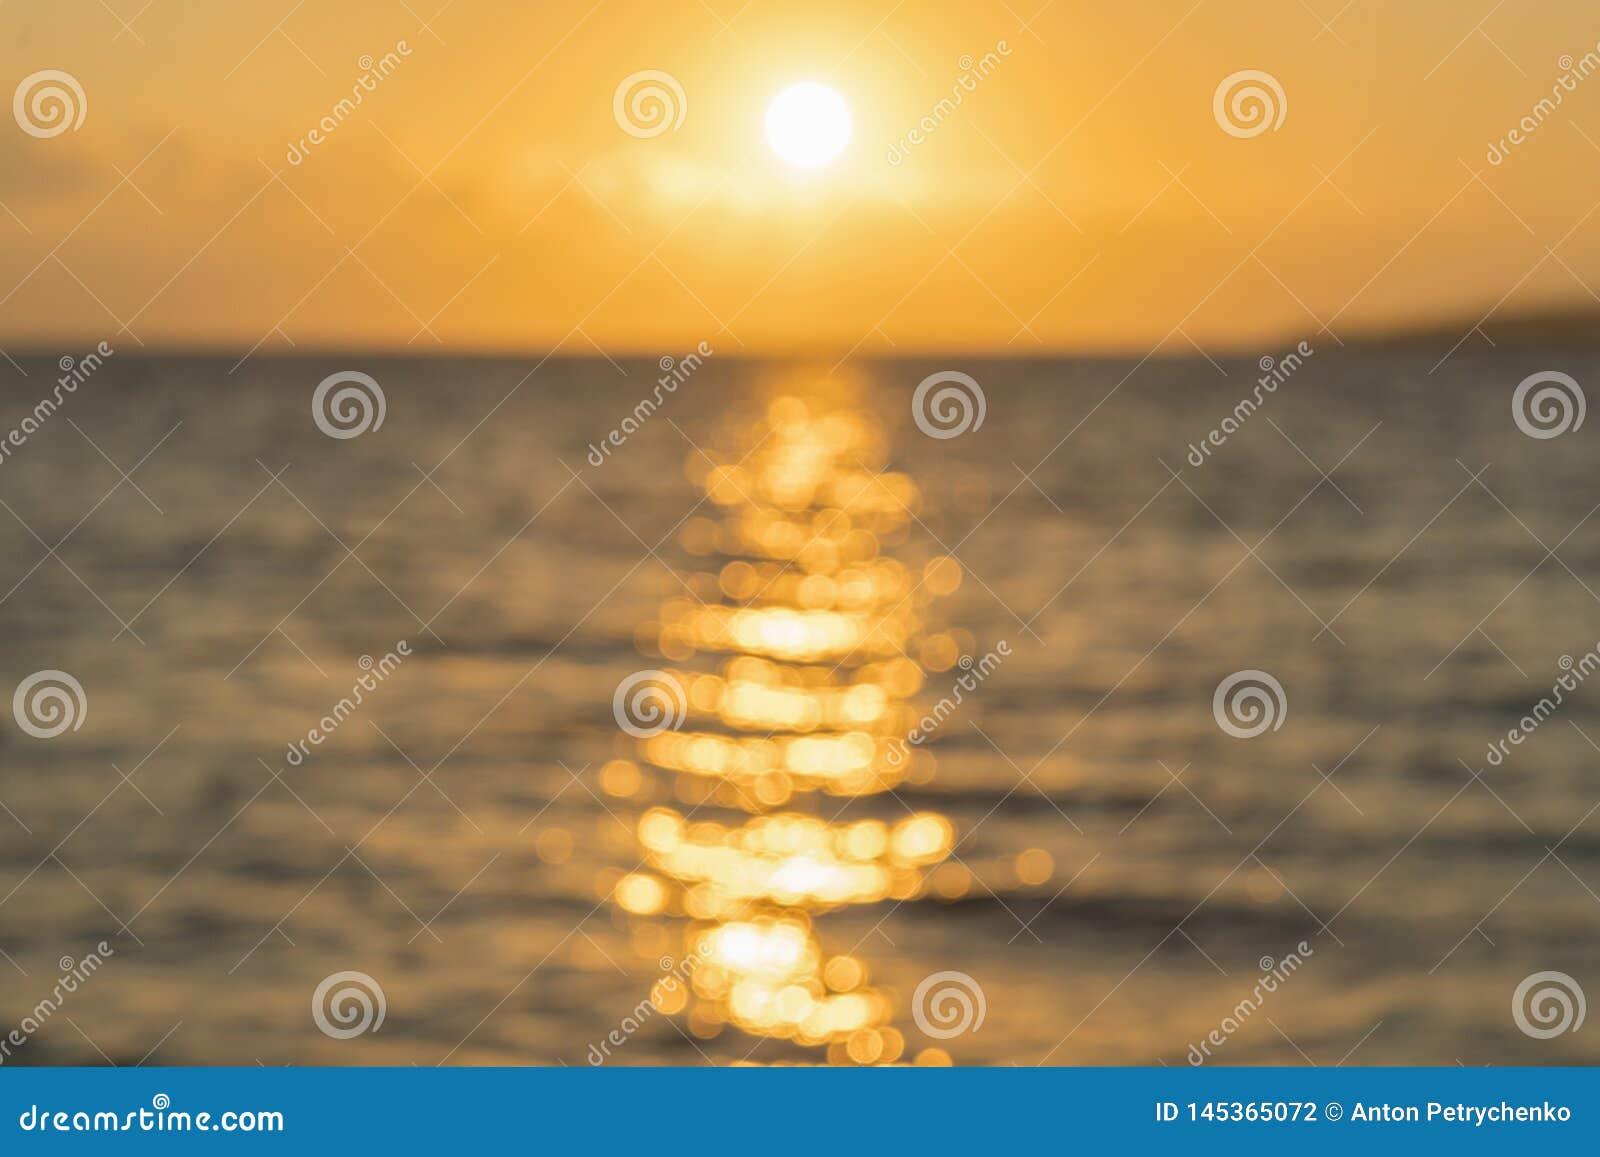 Colorful dawn over the sea, Sunset. Beautiful magic sunset over the sea. blurry